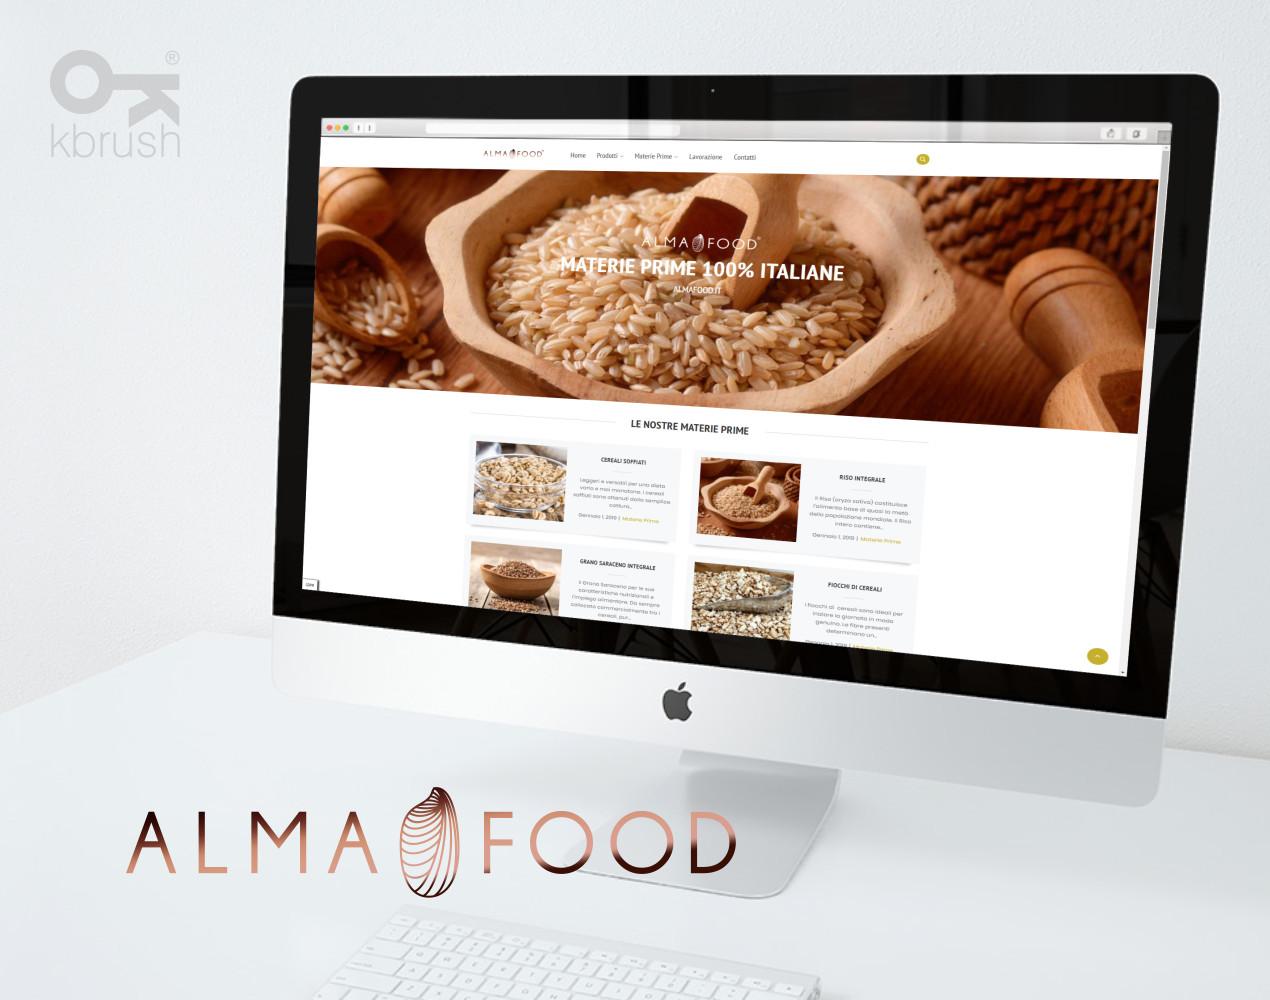 kbrush Studio grafico – Alma Food Sito 2